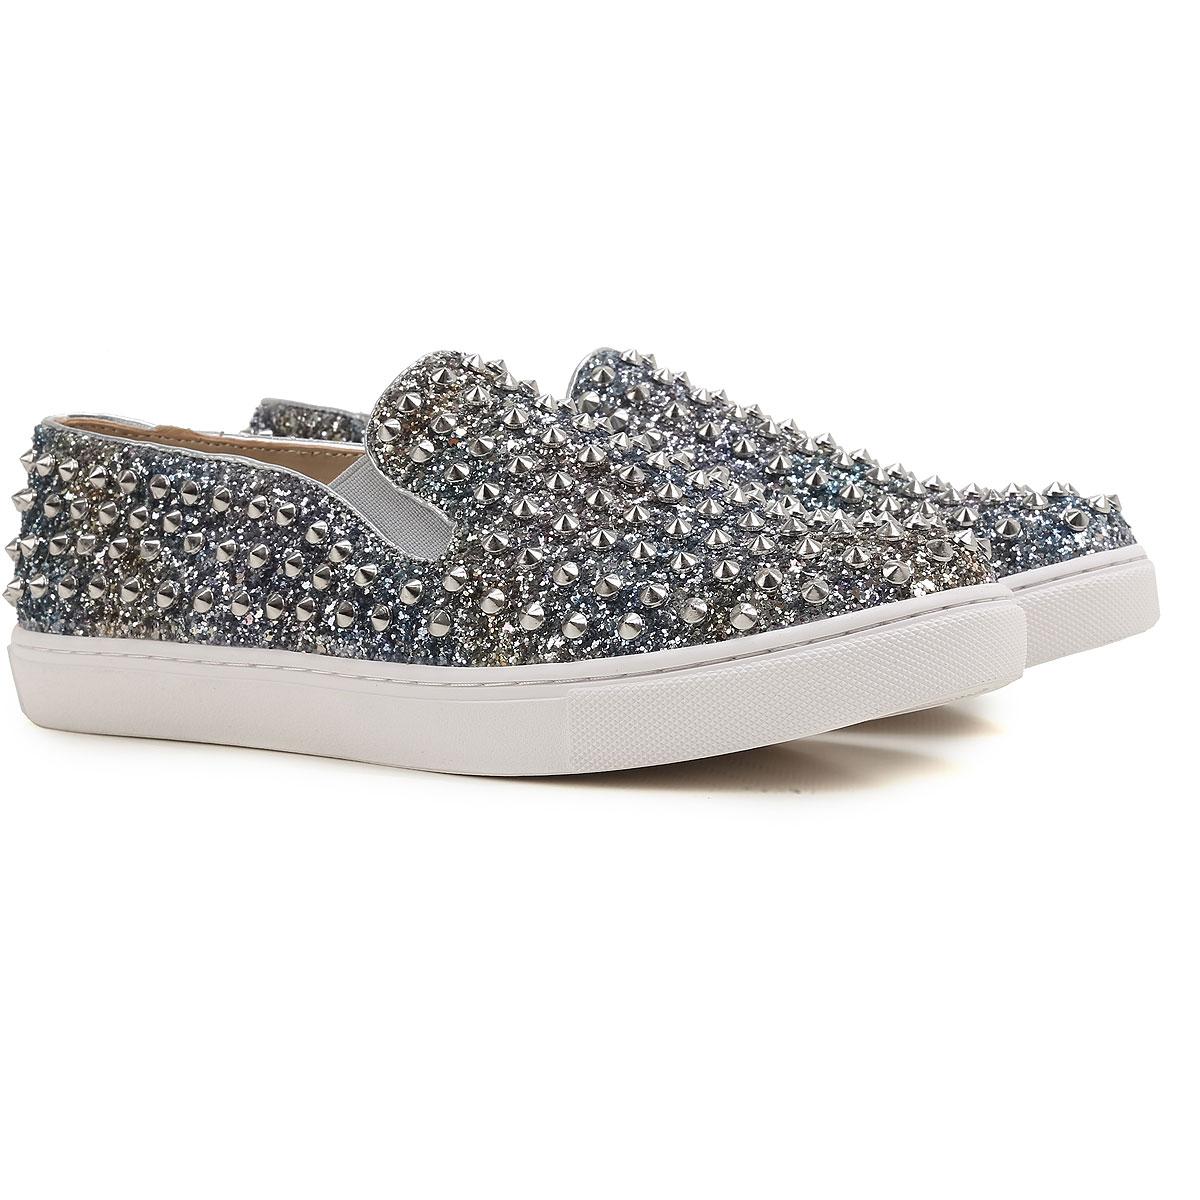 Womens Shoes Steve Madden Style code emmmaassilver 391979